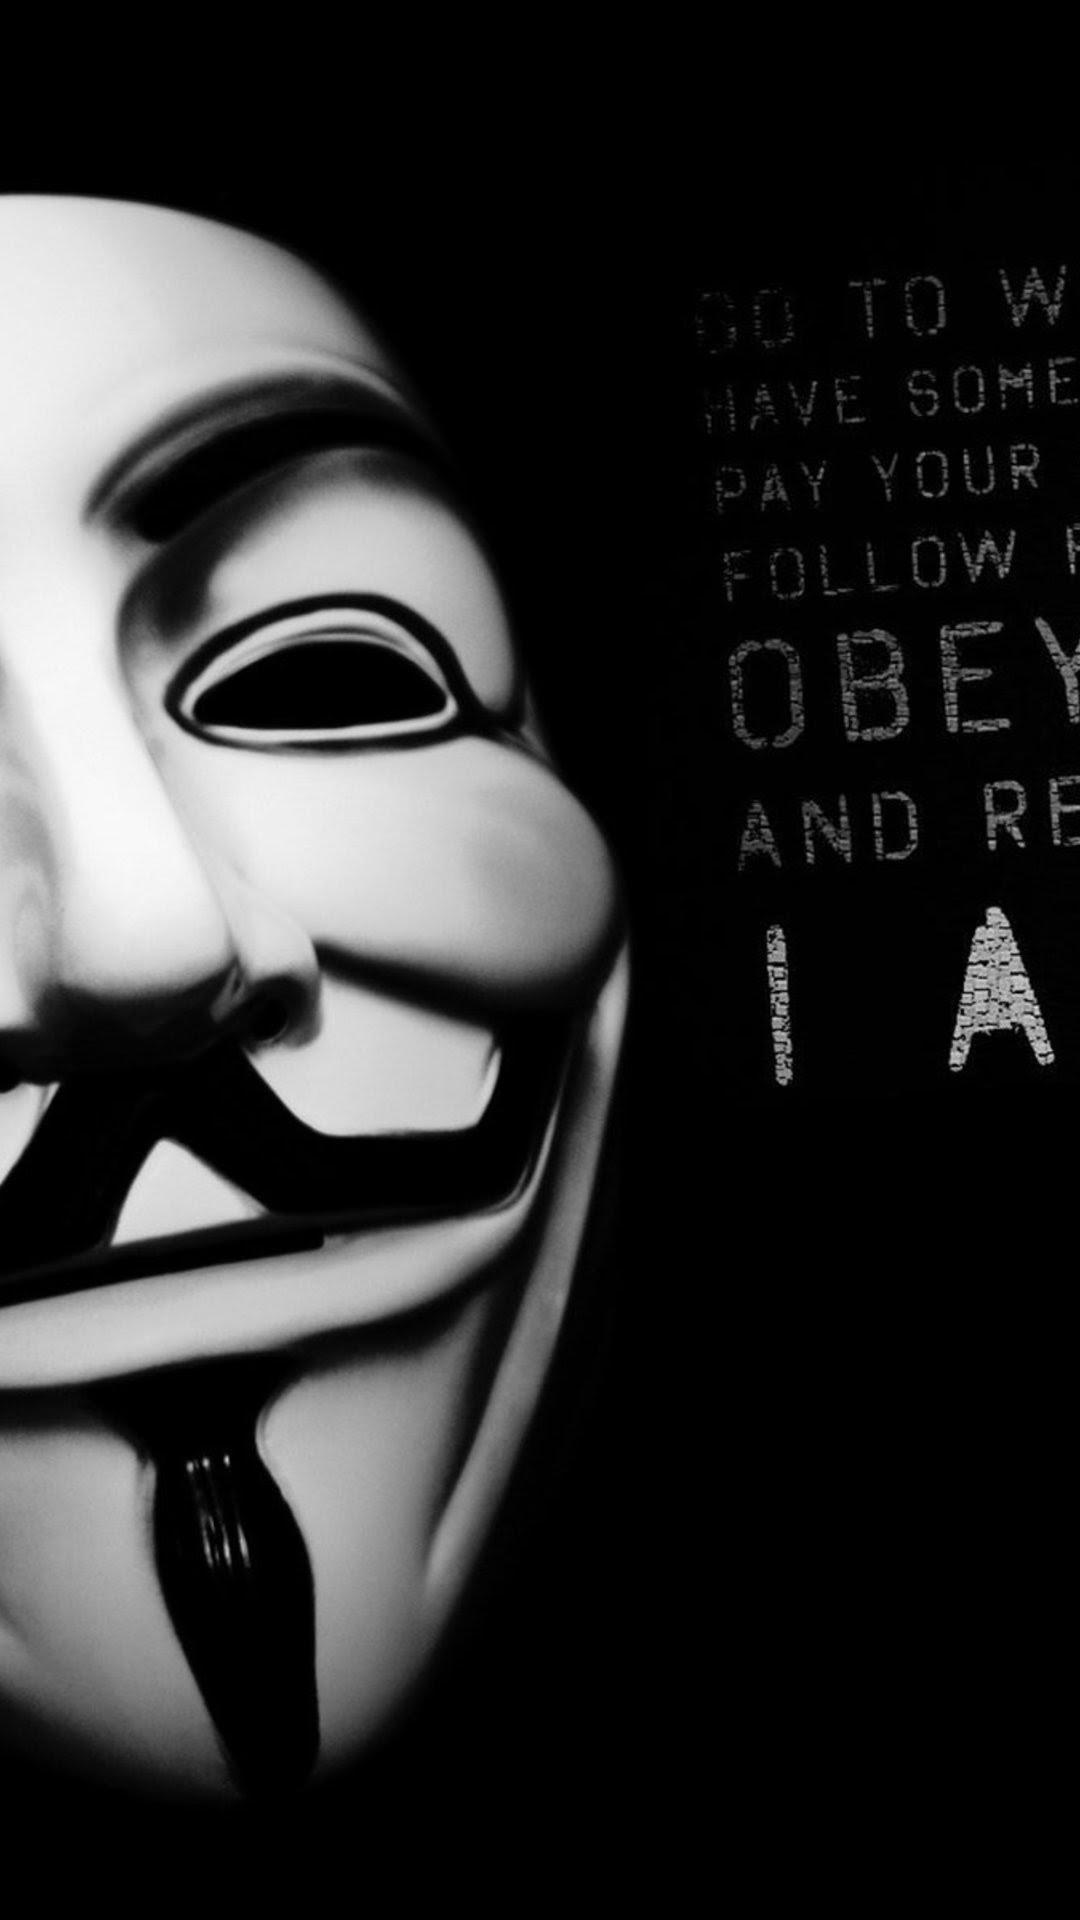 40 Gambar Keren Topeng Anonymous Gratis Terbaru